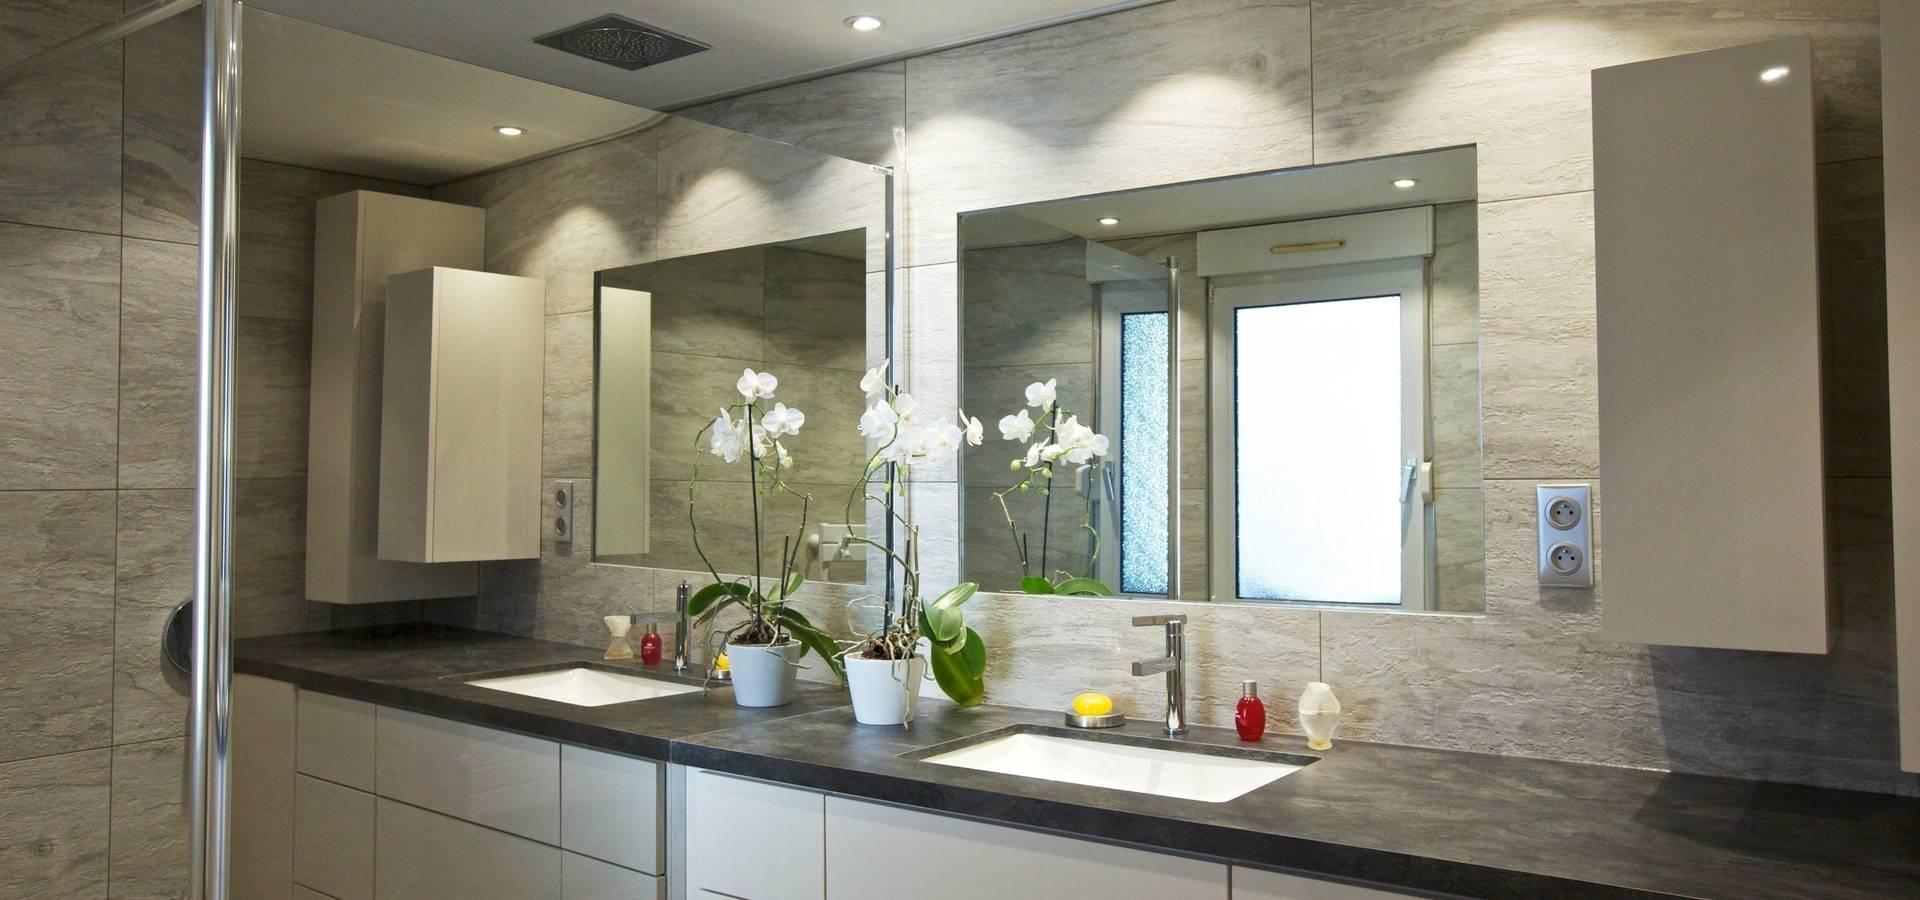 Salle De Bain Com salle de bain dupea3 design | homify